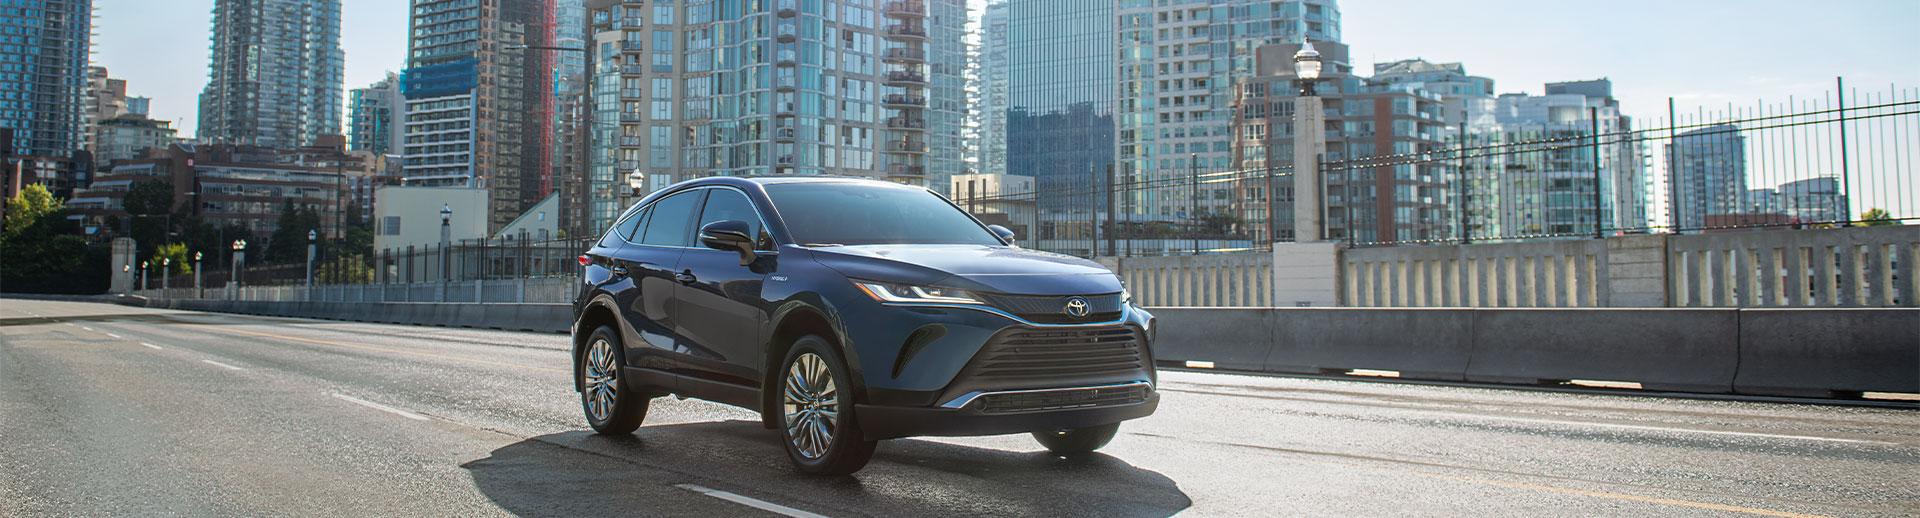 2021 Toyota Venza Lifestyle Photo